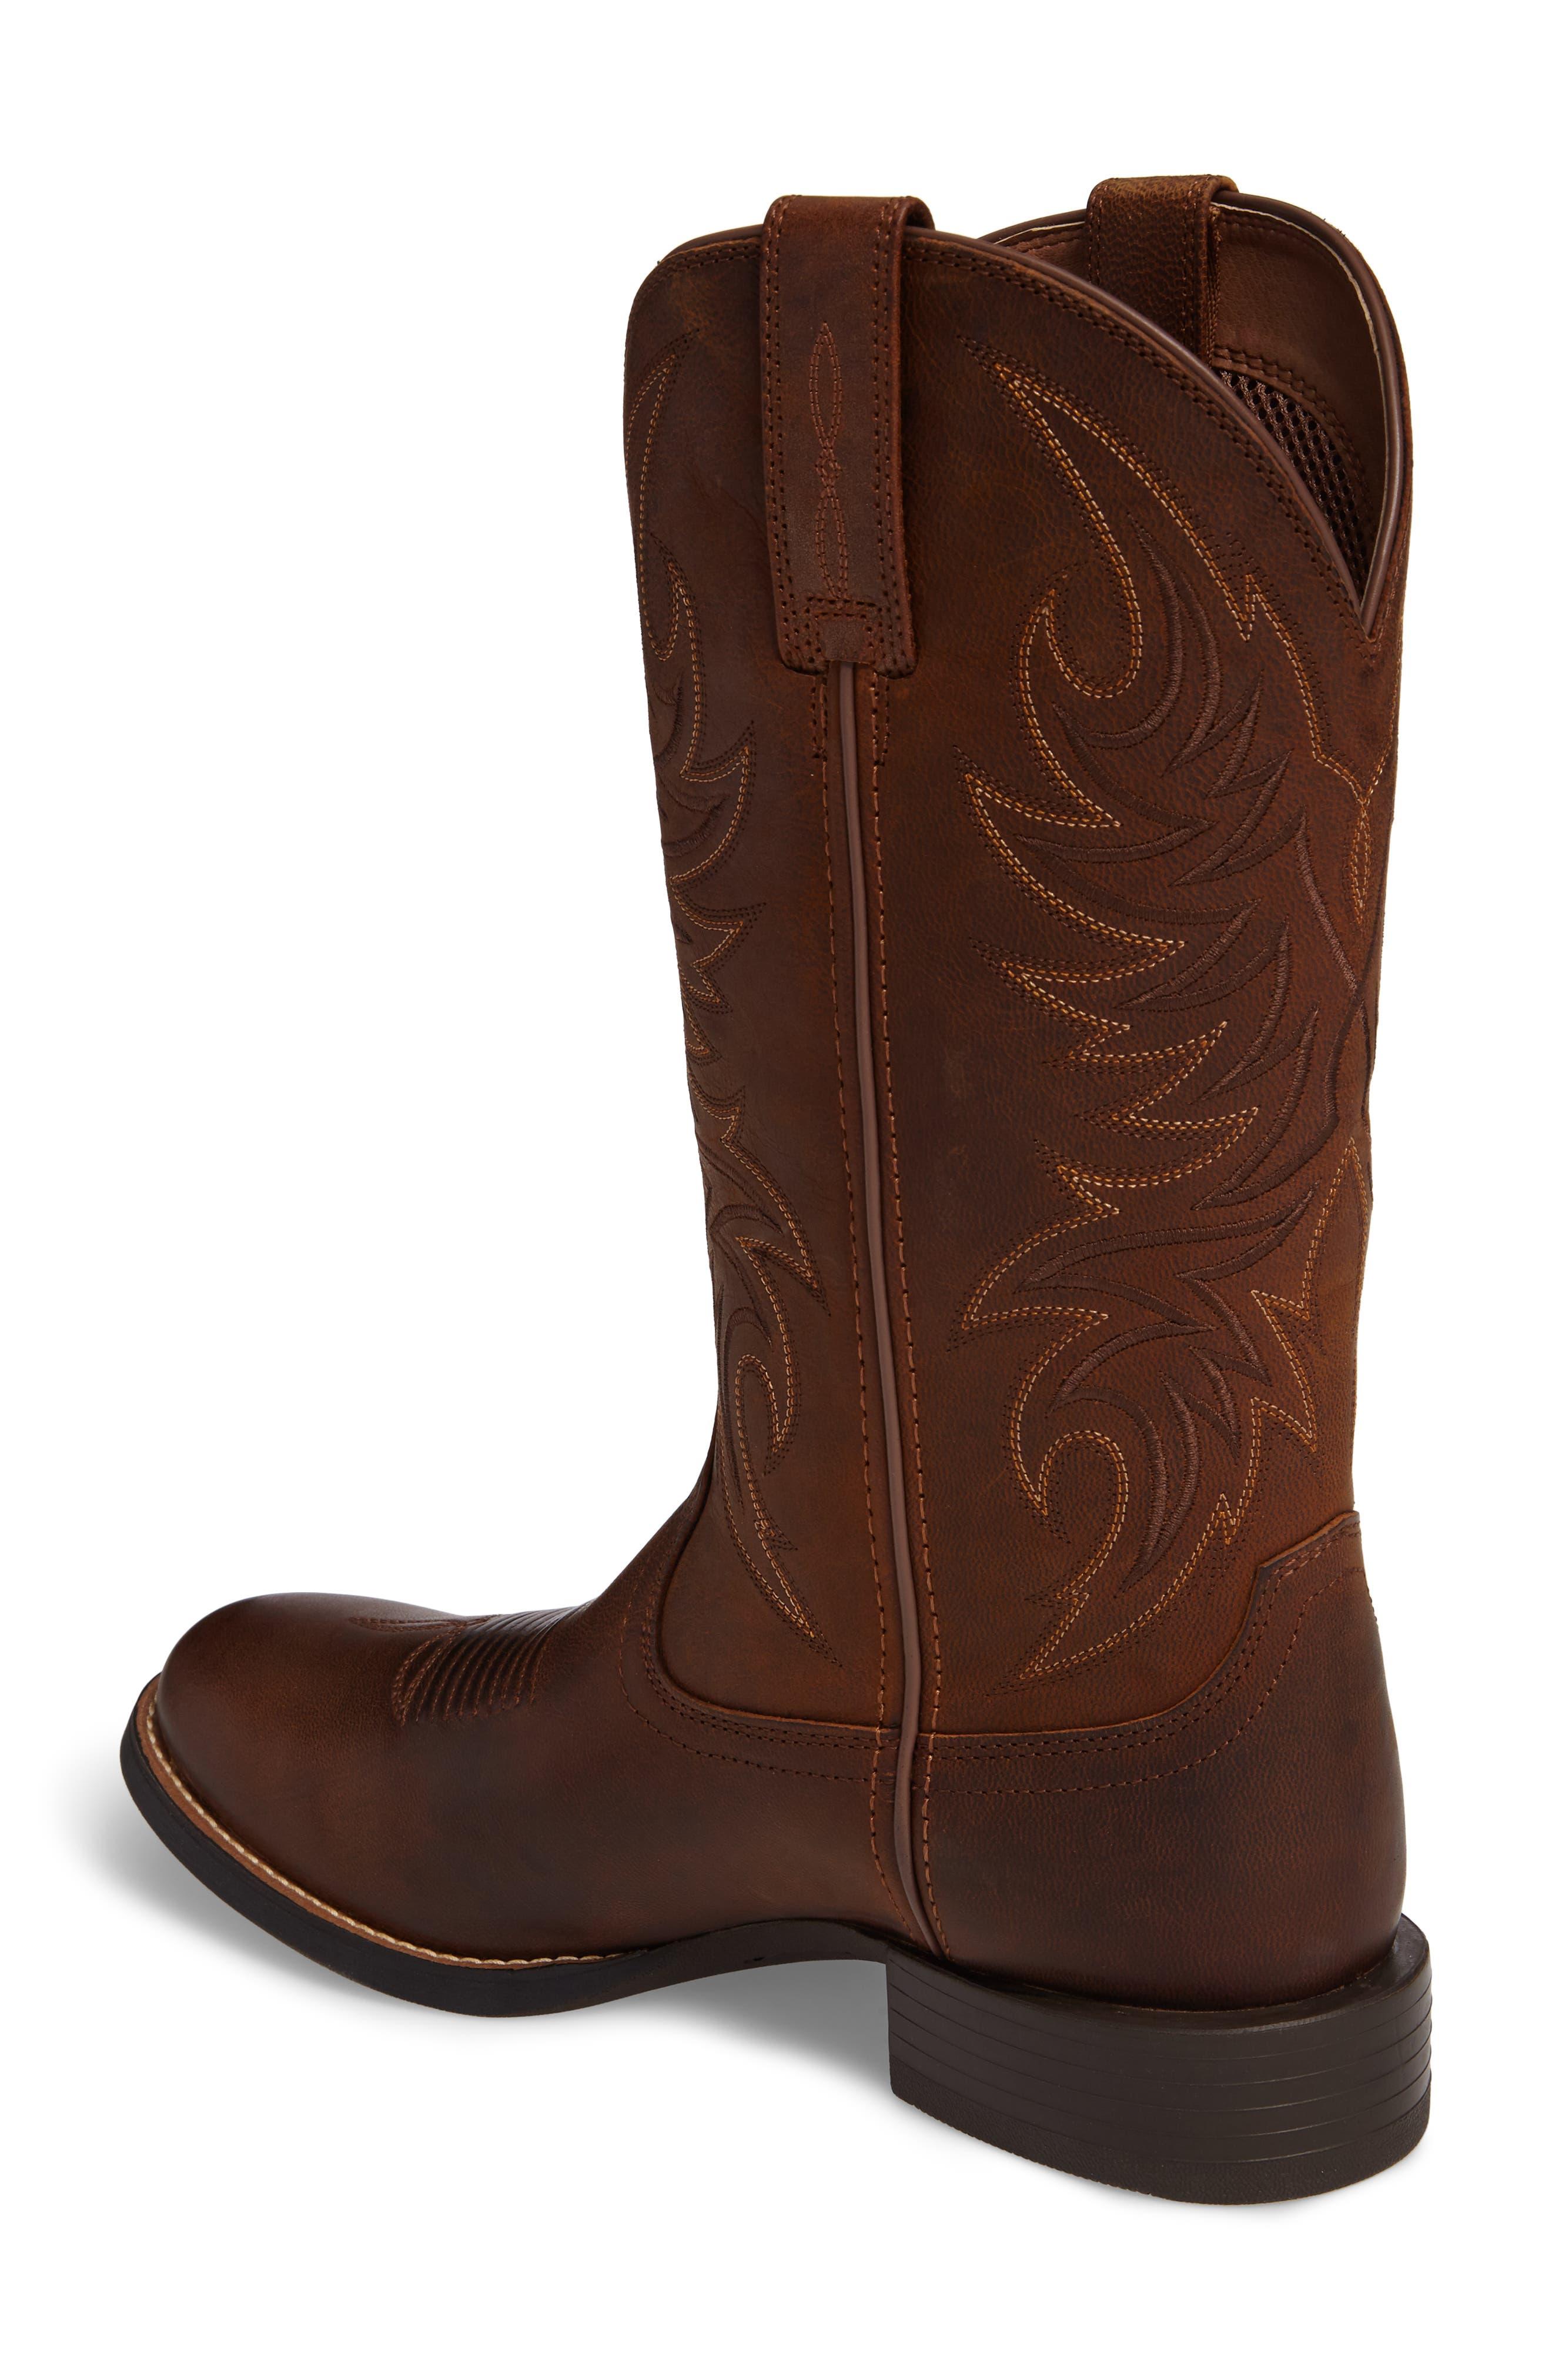 Sport Horsemen Cowboy Boot,                             Alternate thumbnail 2, color,                             Tan/ Pesto